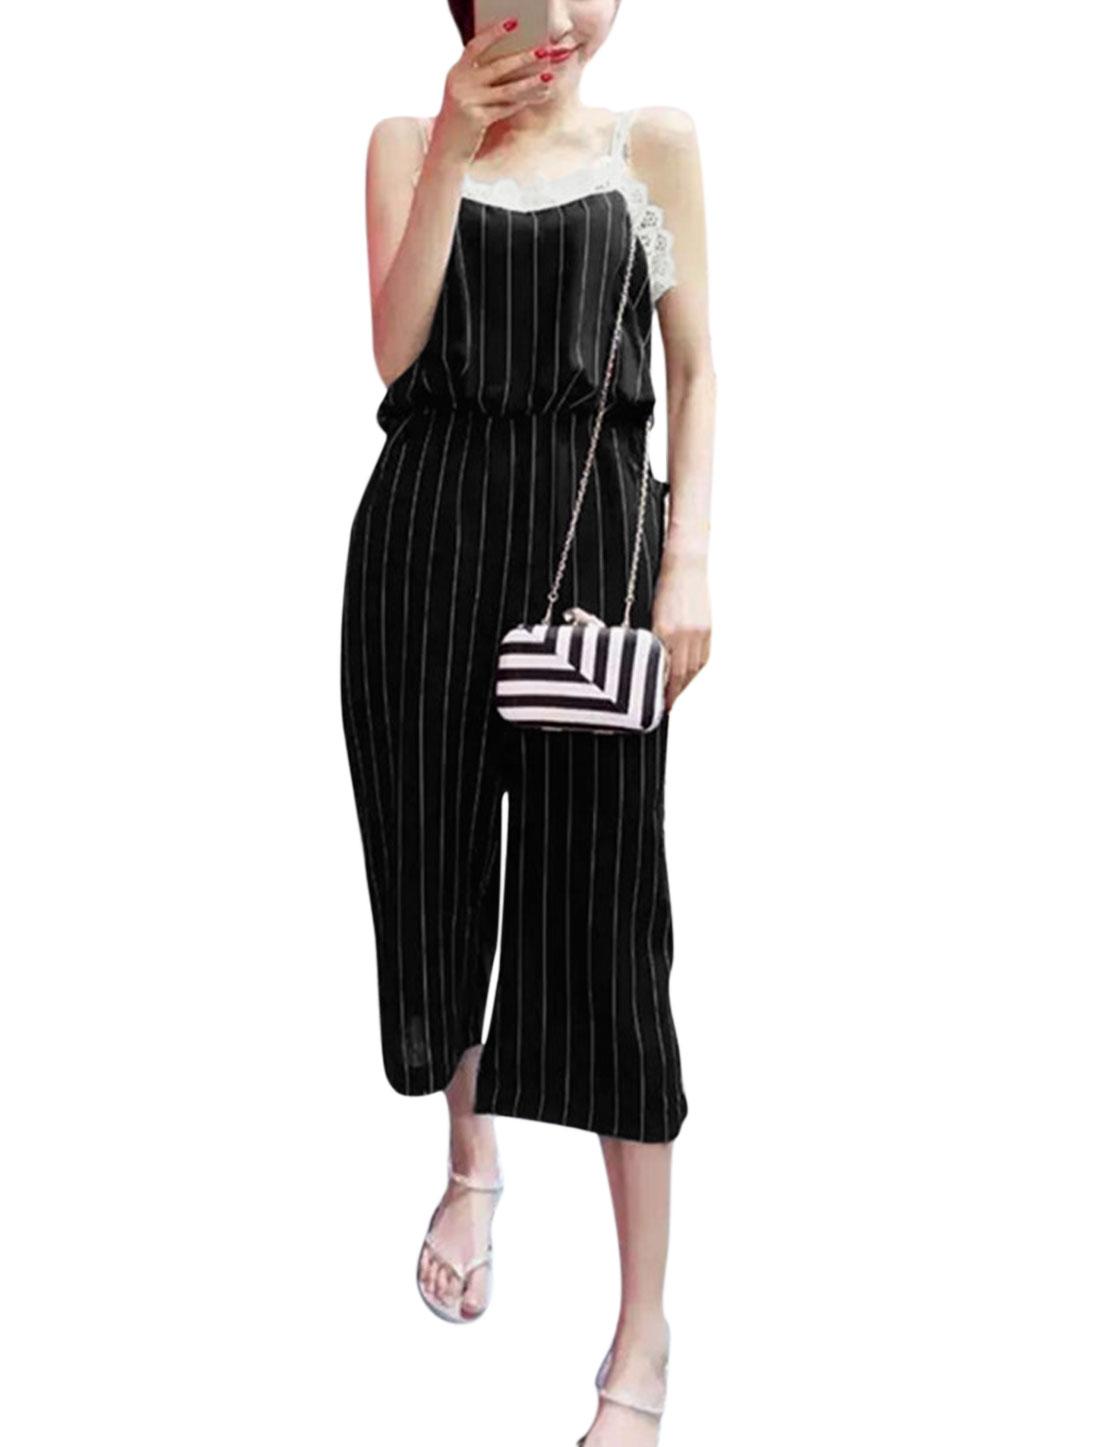 Women Vertical Stripes Crochet Design Elastic Waist Jumpsuit Black S